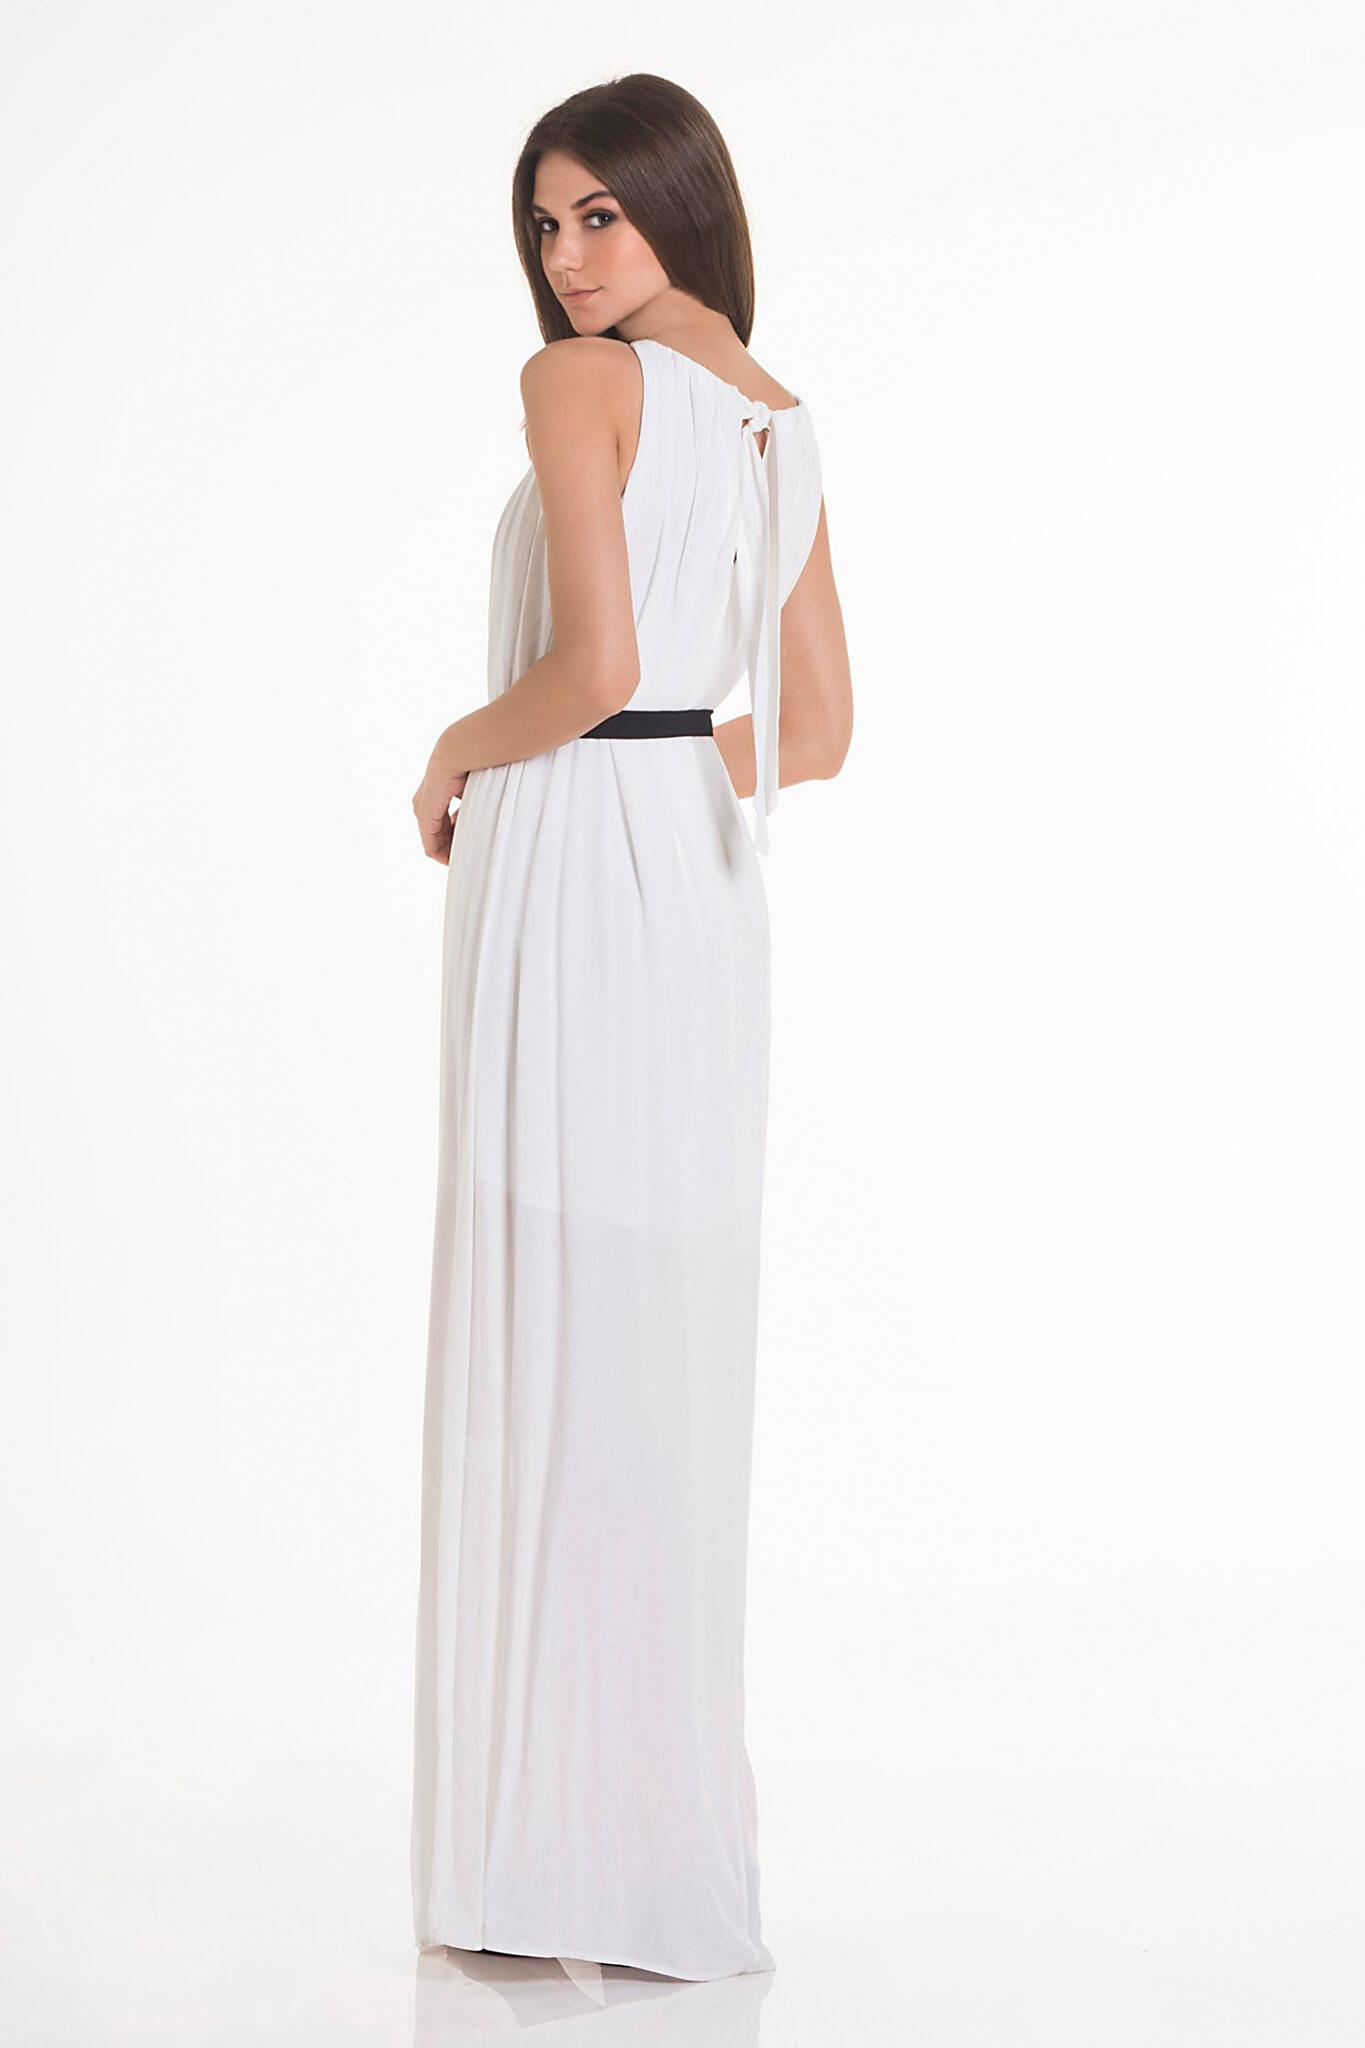 96a6a1cfb44e Γυναικεία Φορέματα - Joy Fashion House - Σελίδα 6